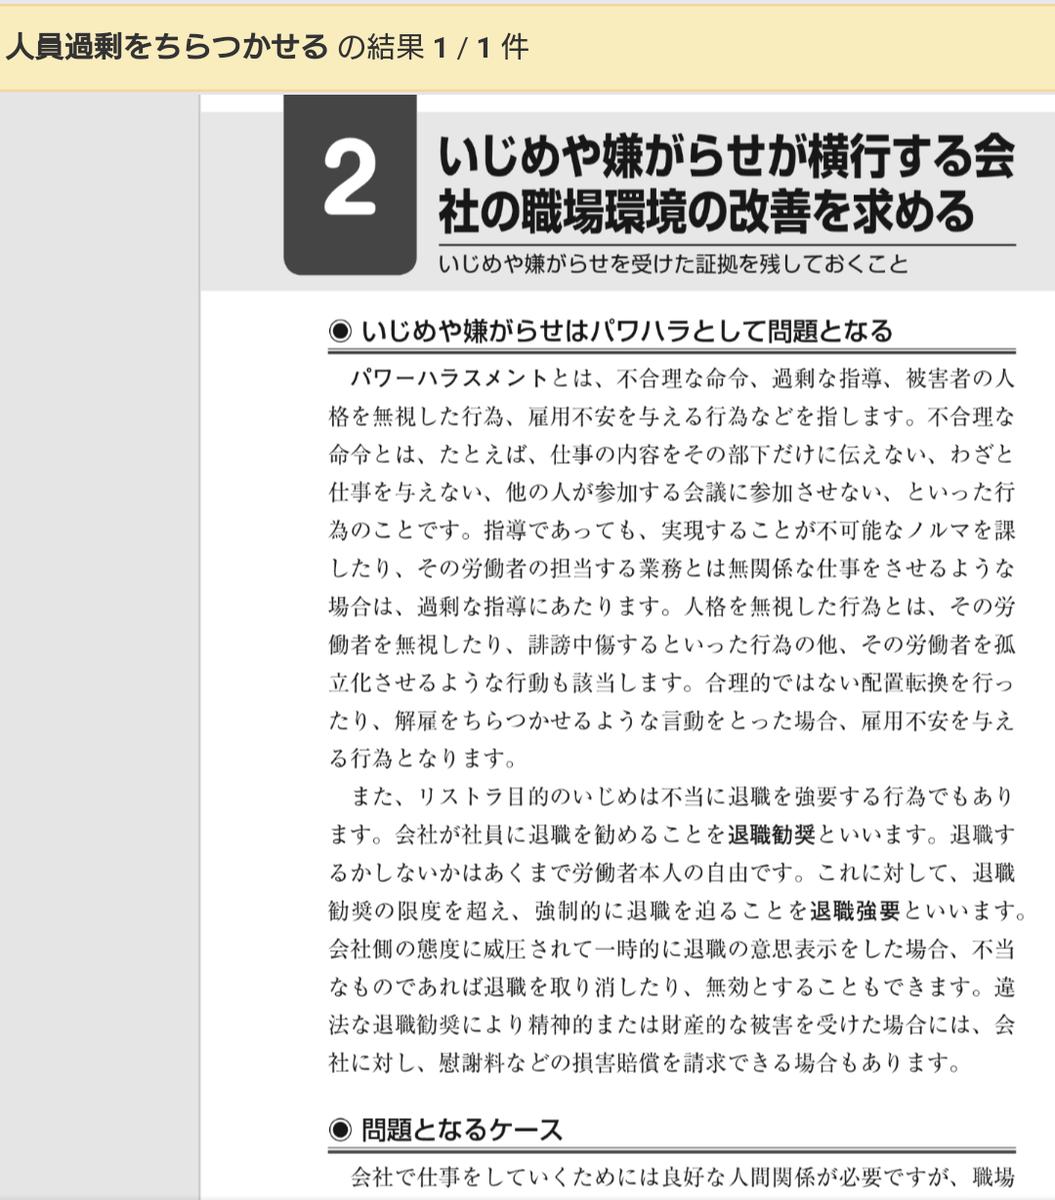 f:id:Kinokawaryokusan:20200211165310p:plain